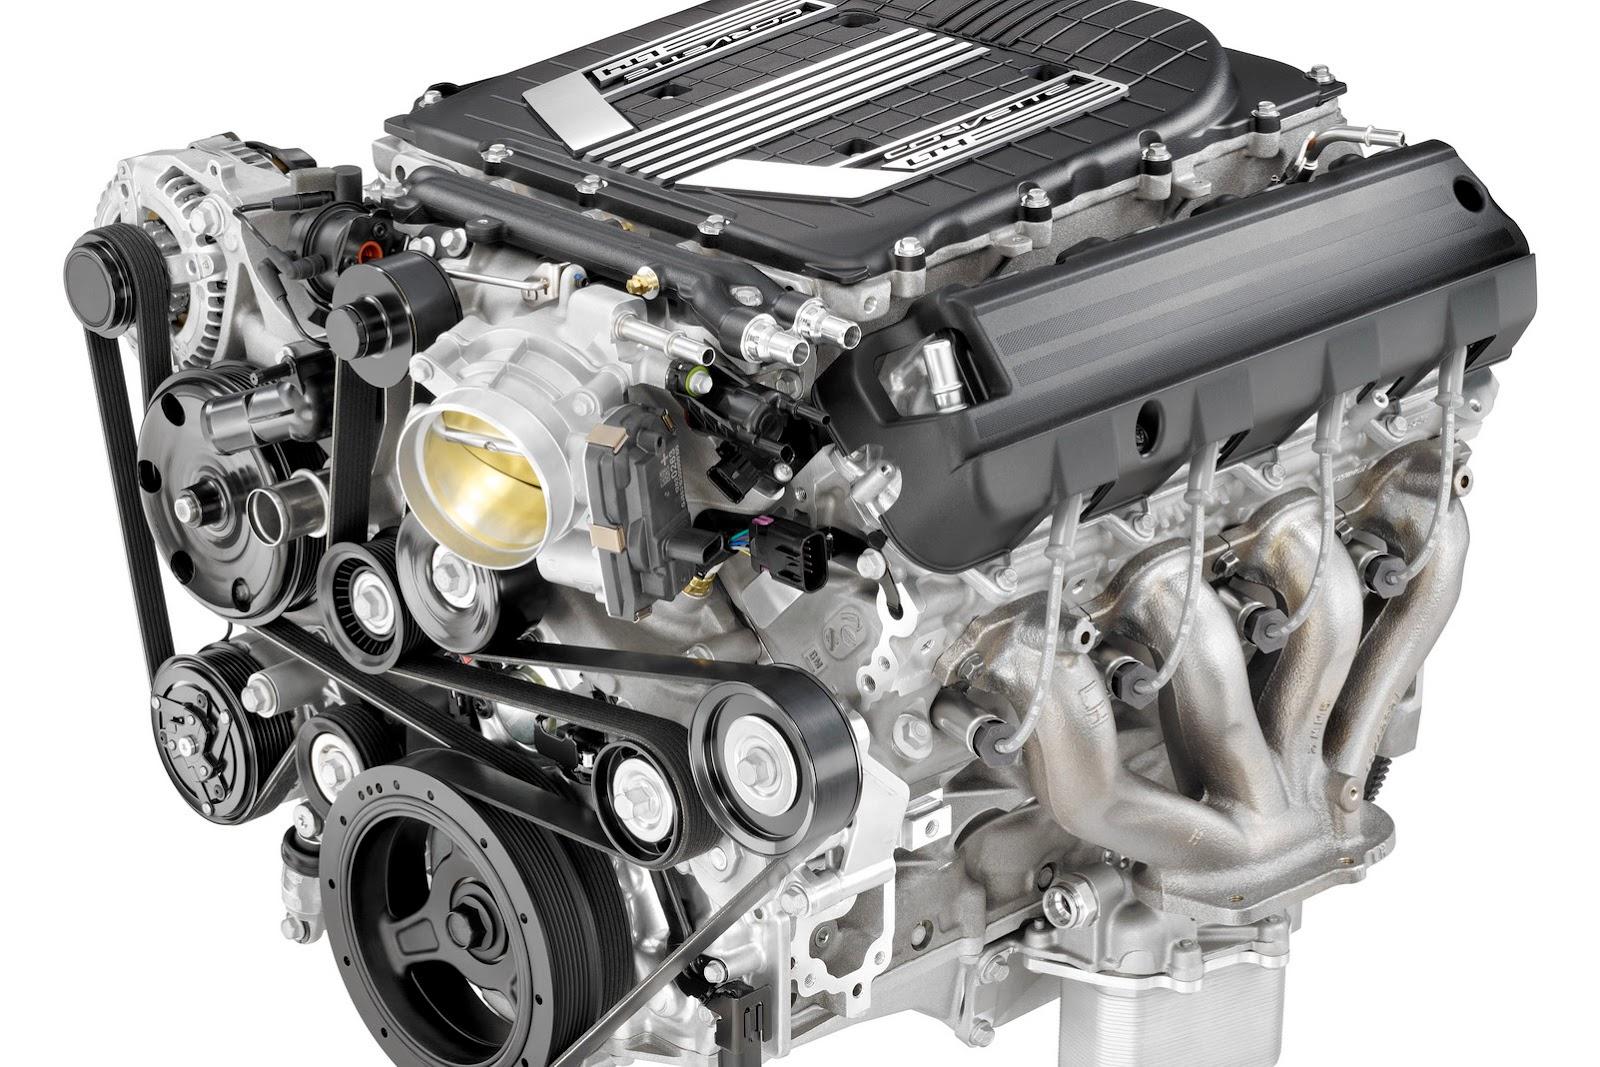 YaMZ-536 engine: description, specifications, instruction manual 78